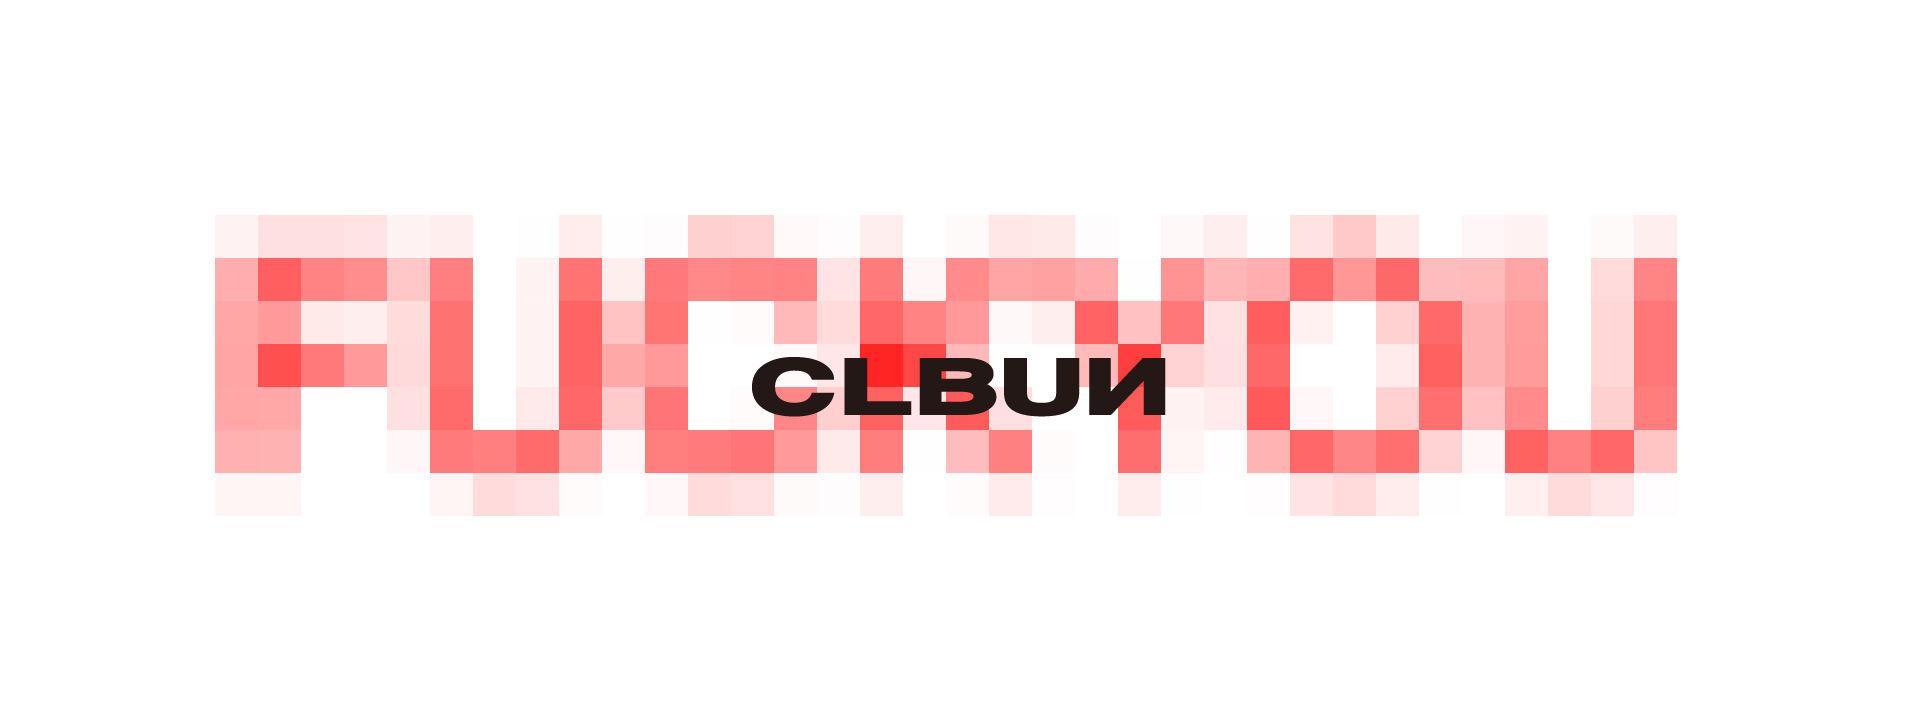 CLBUN